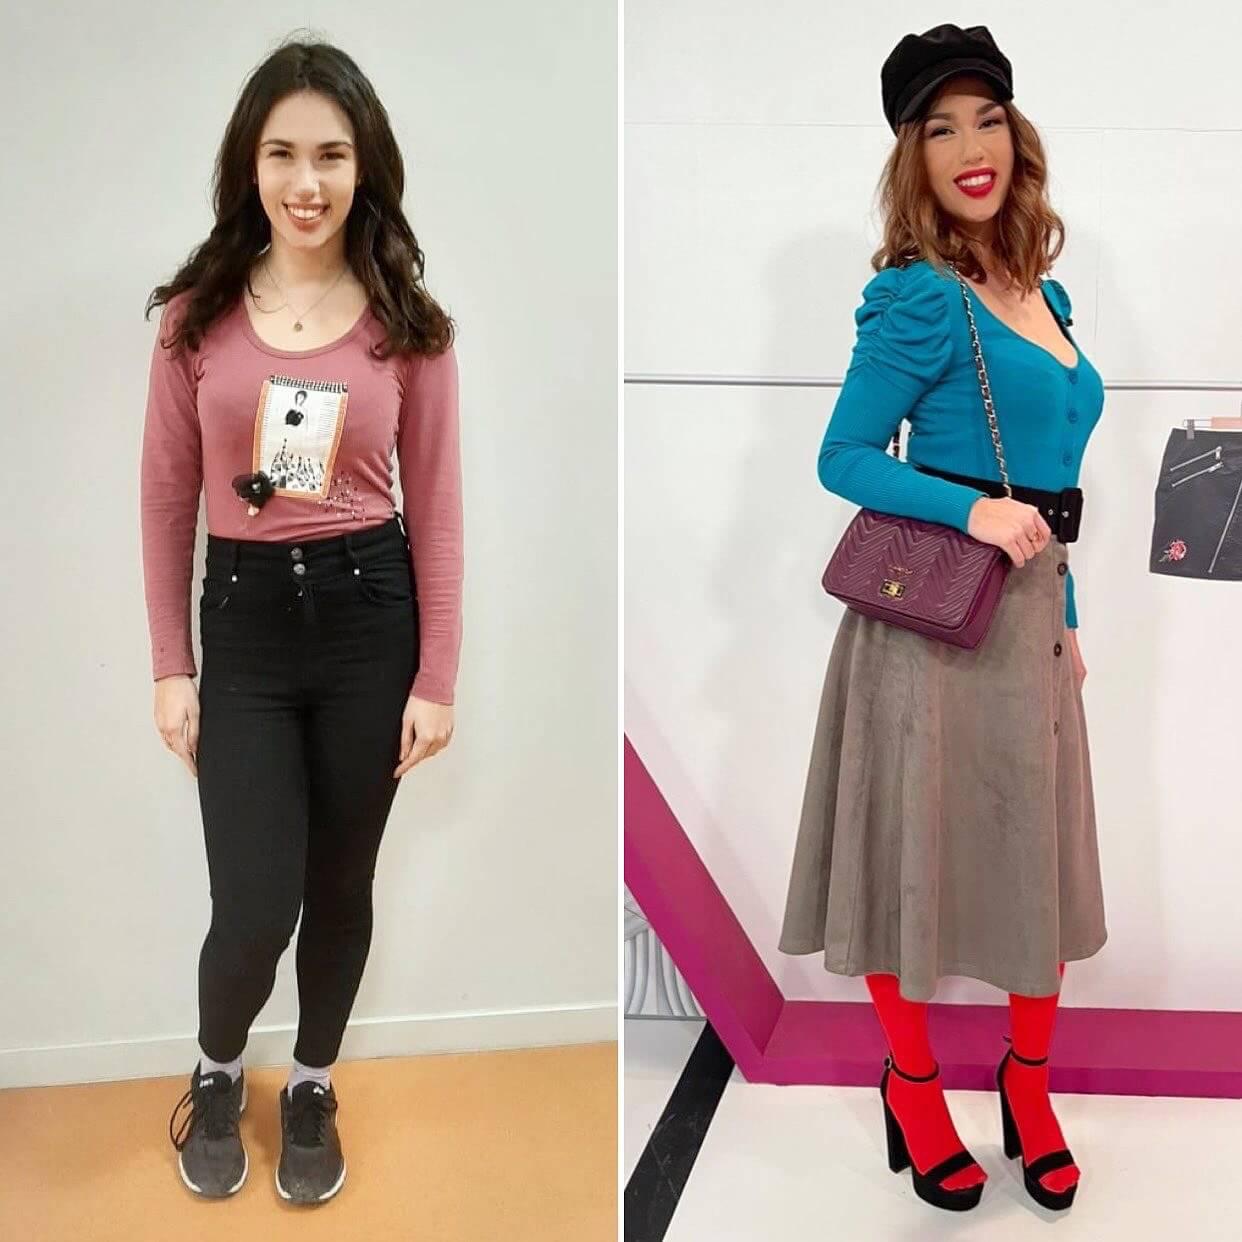 """Style Me Up"": Η Νατάσα απέκτησε ένα κομψό και σύγχρονο στιλ με τη βοήθεια του Δημήτρη Αλεξάνδρου"